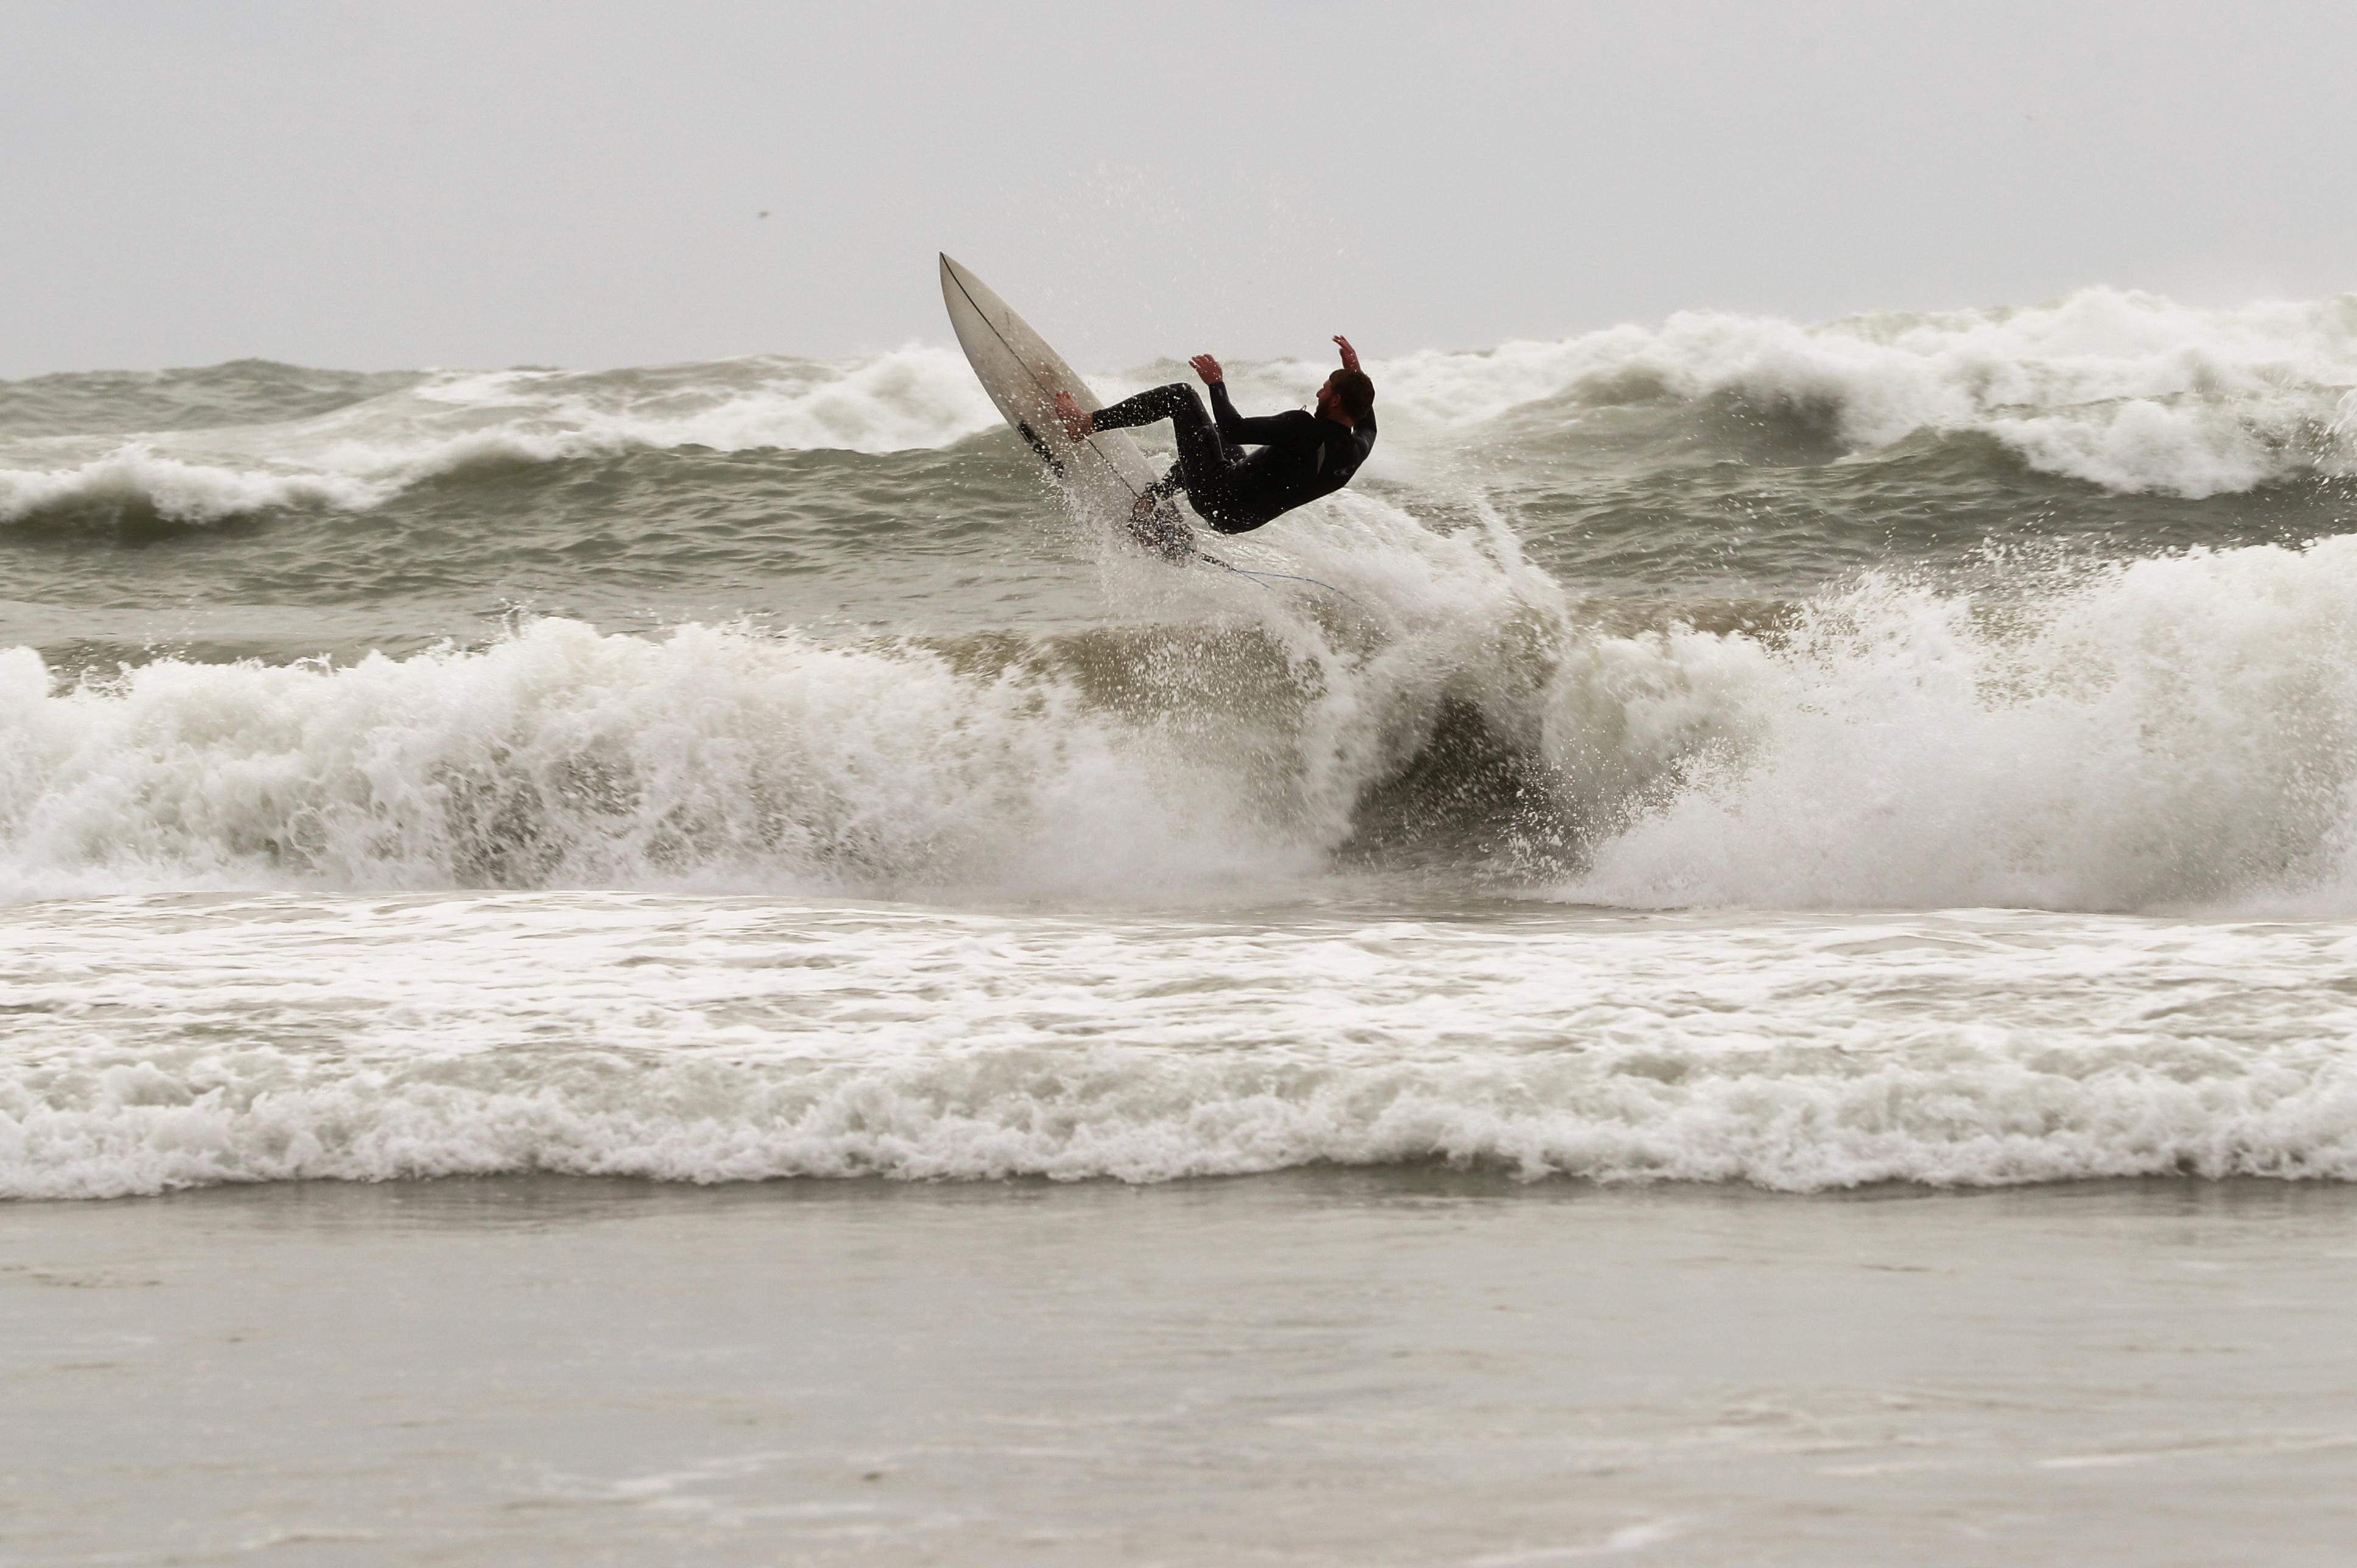 A man surfs in the Mediterranean Sea amid Israel's third national lockdown to curb rising coronavirus disease (COVID-19) infections, at a beach in Tel Aviv, Israel January 19, 2021. REUTERS/Ammar Awad